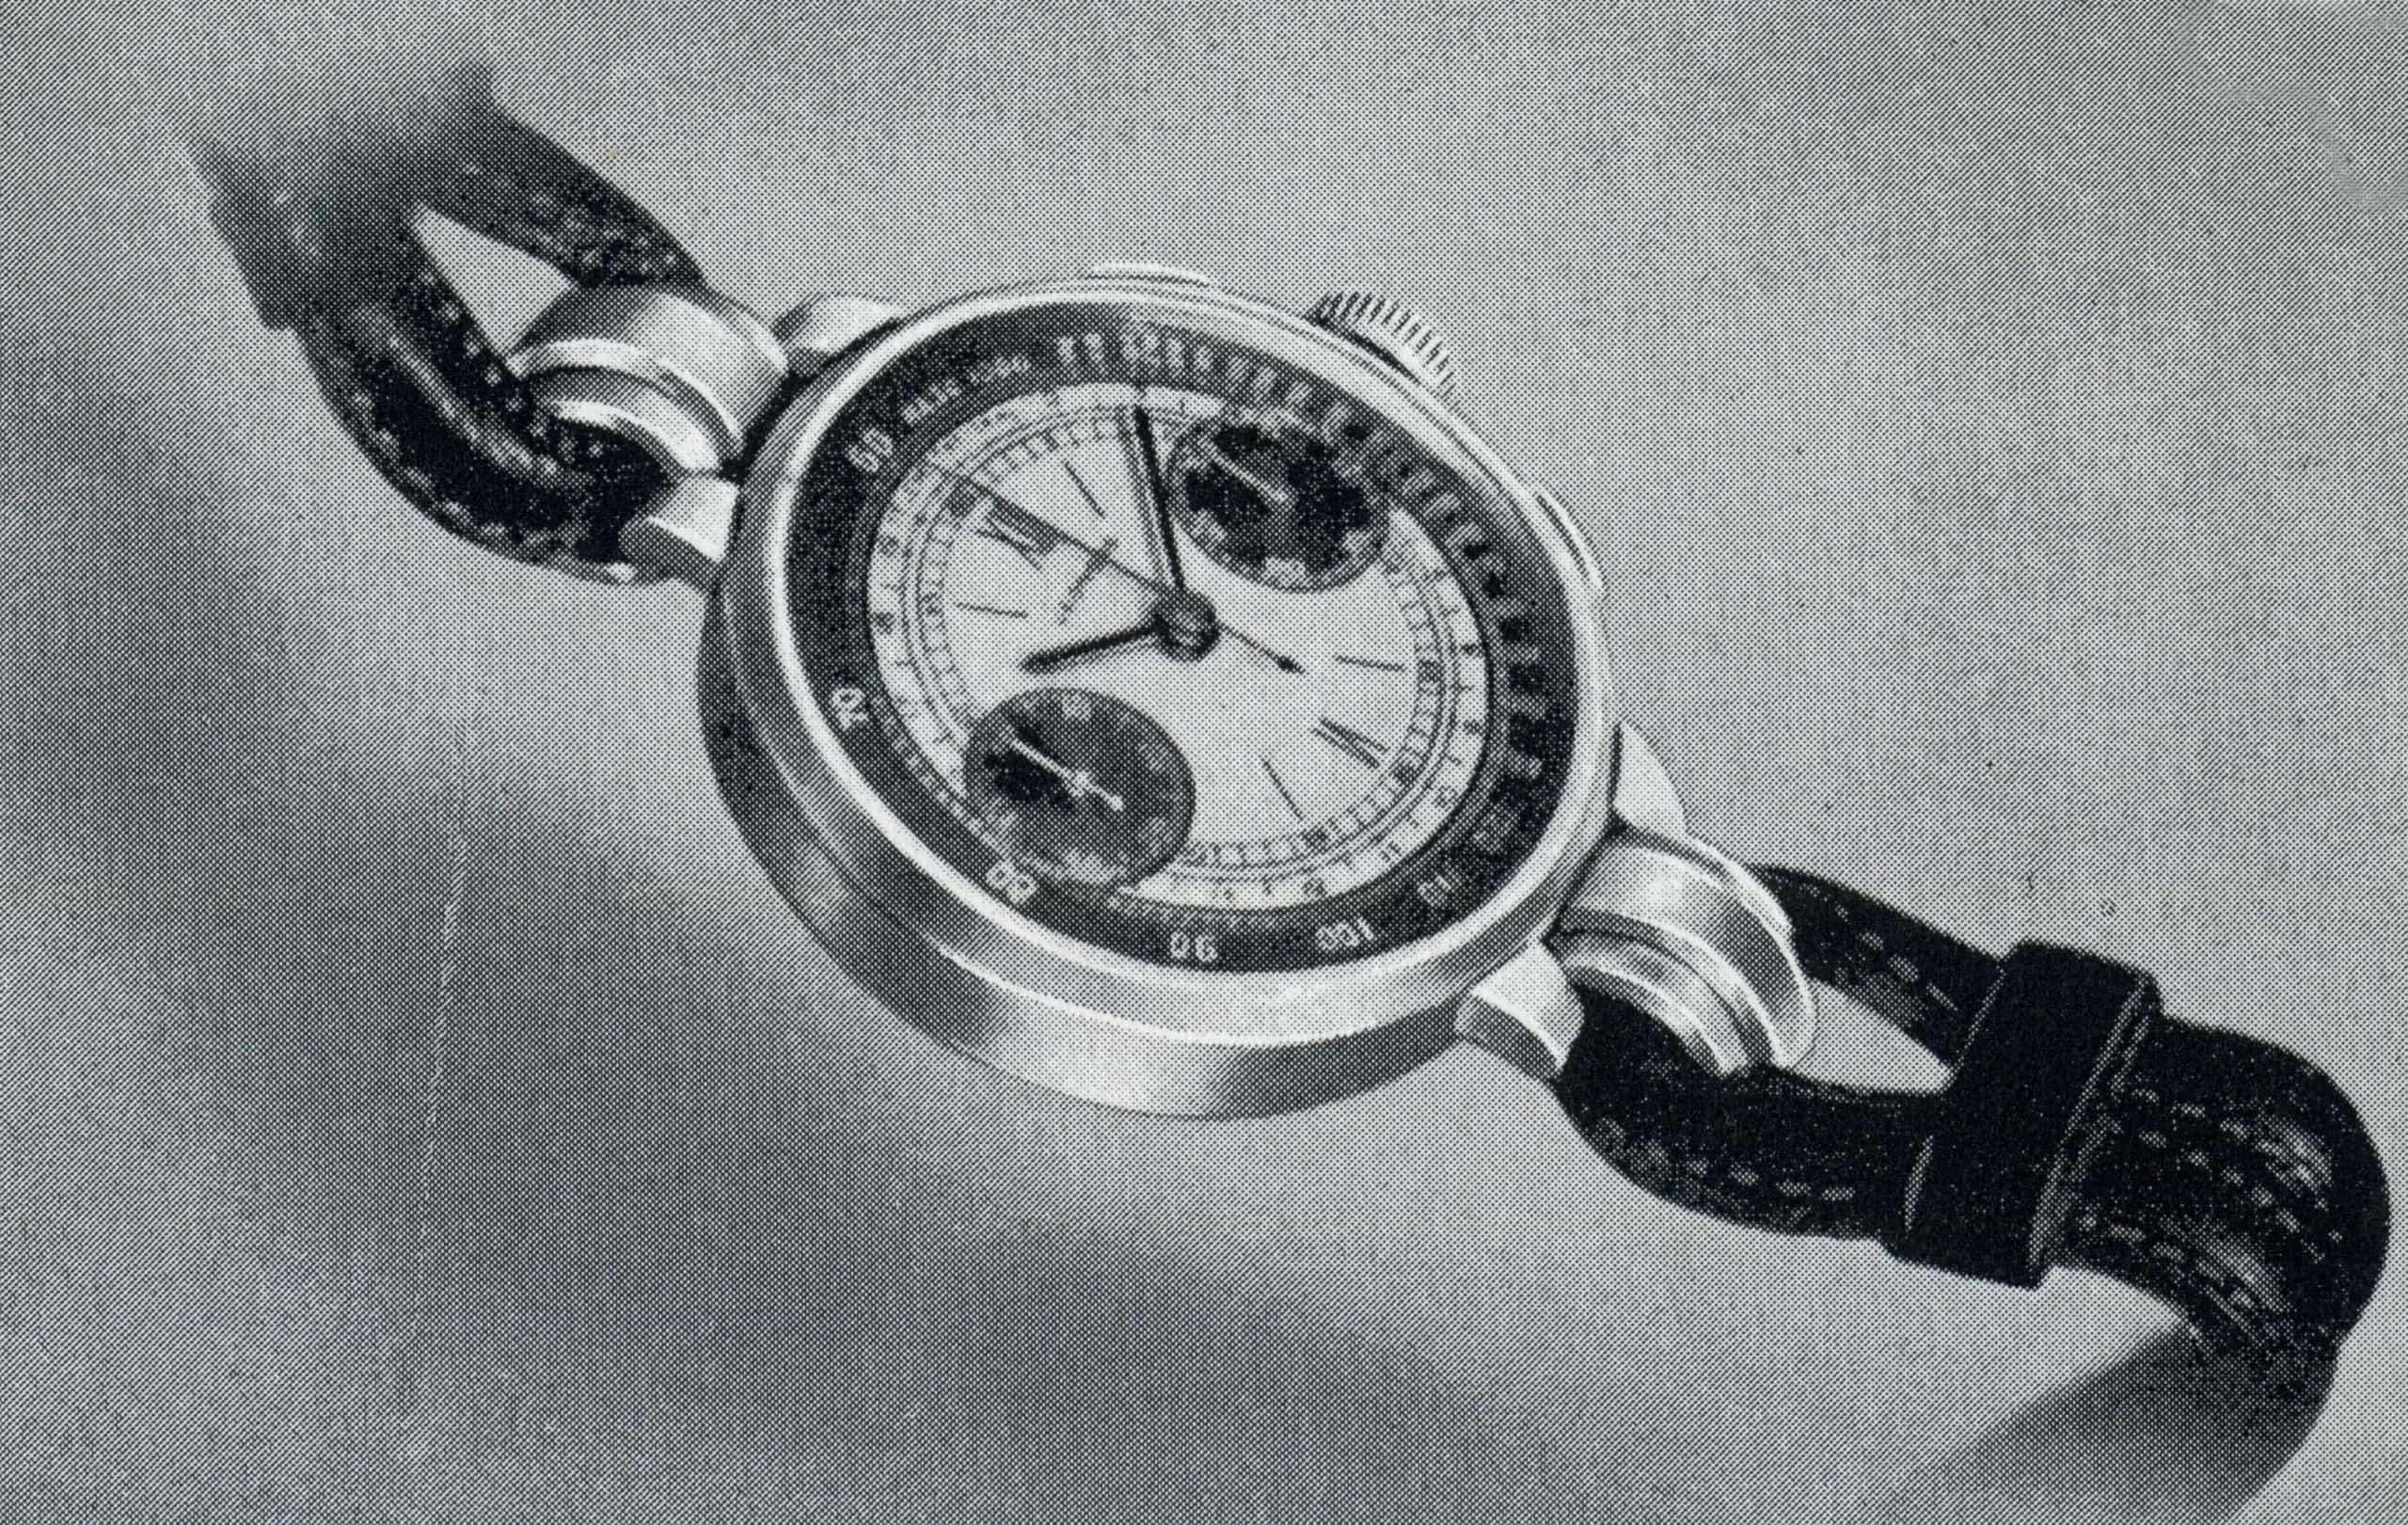 Vintage Leonidas Chronograph auf Ebay